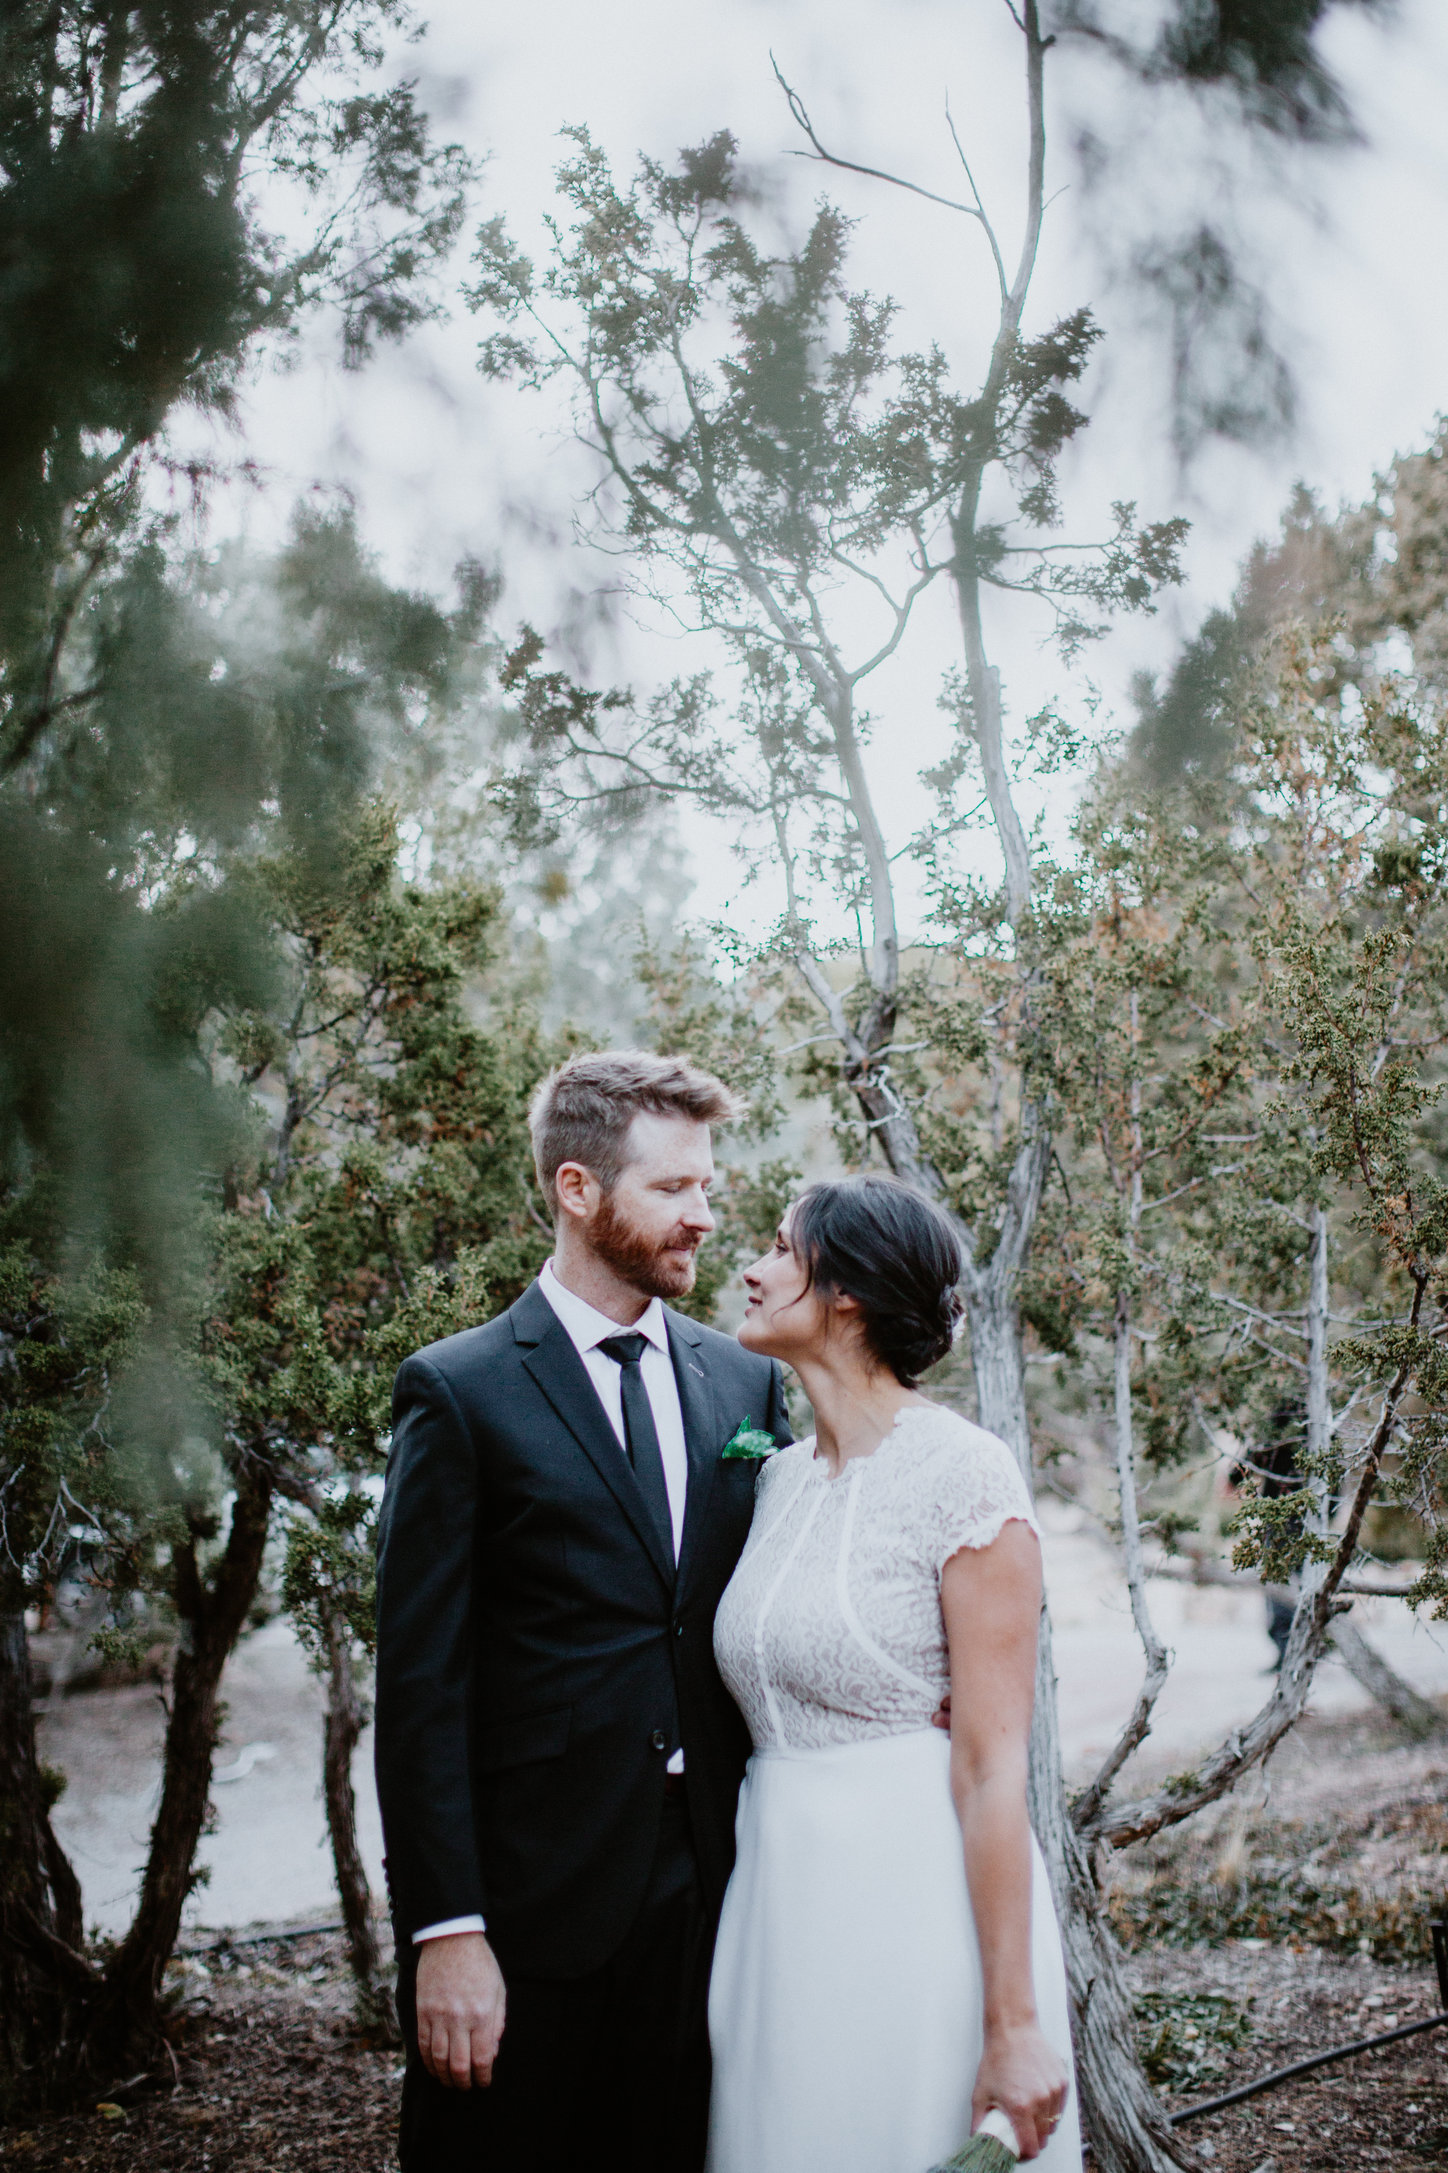 HandM-wedding-155.jpg